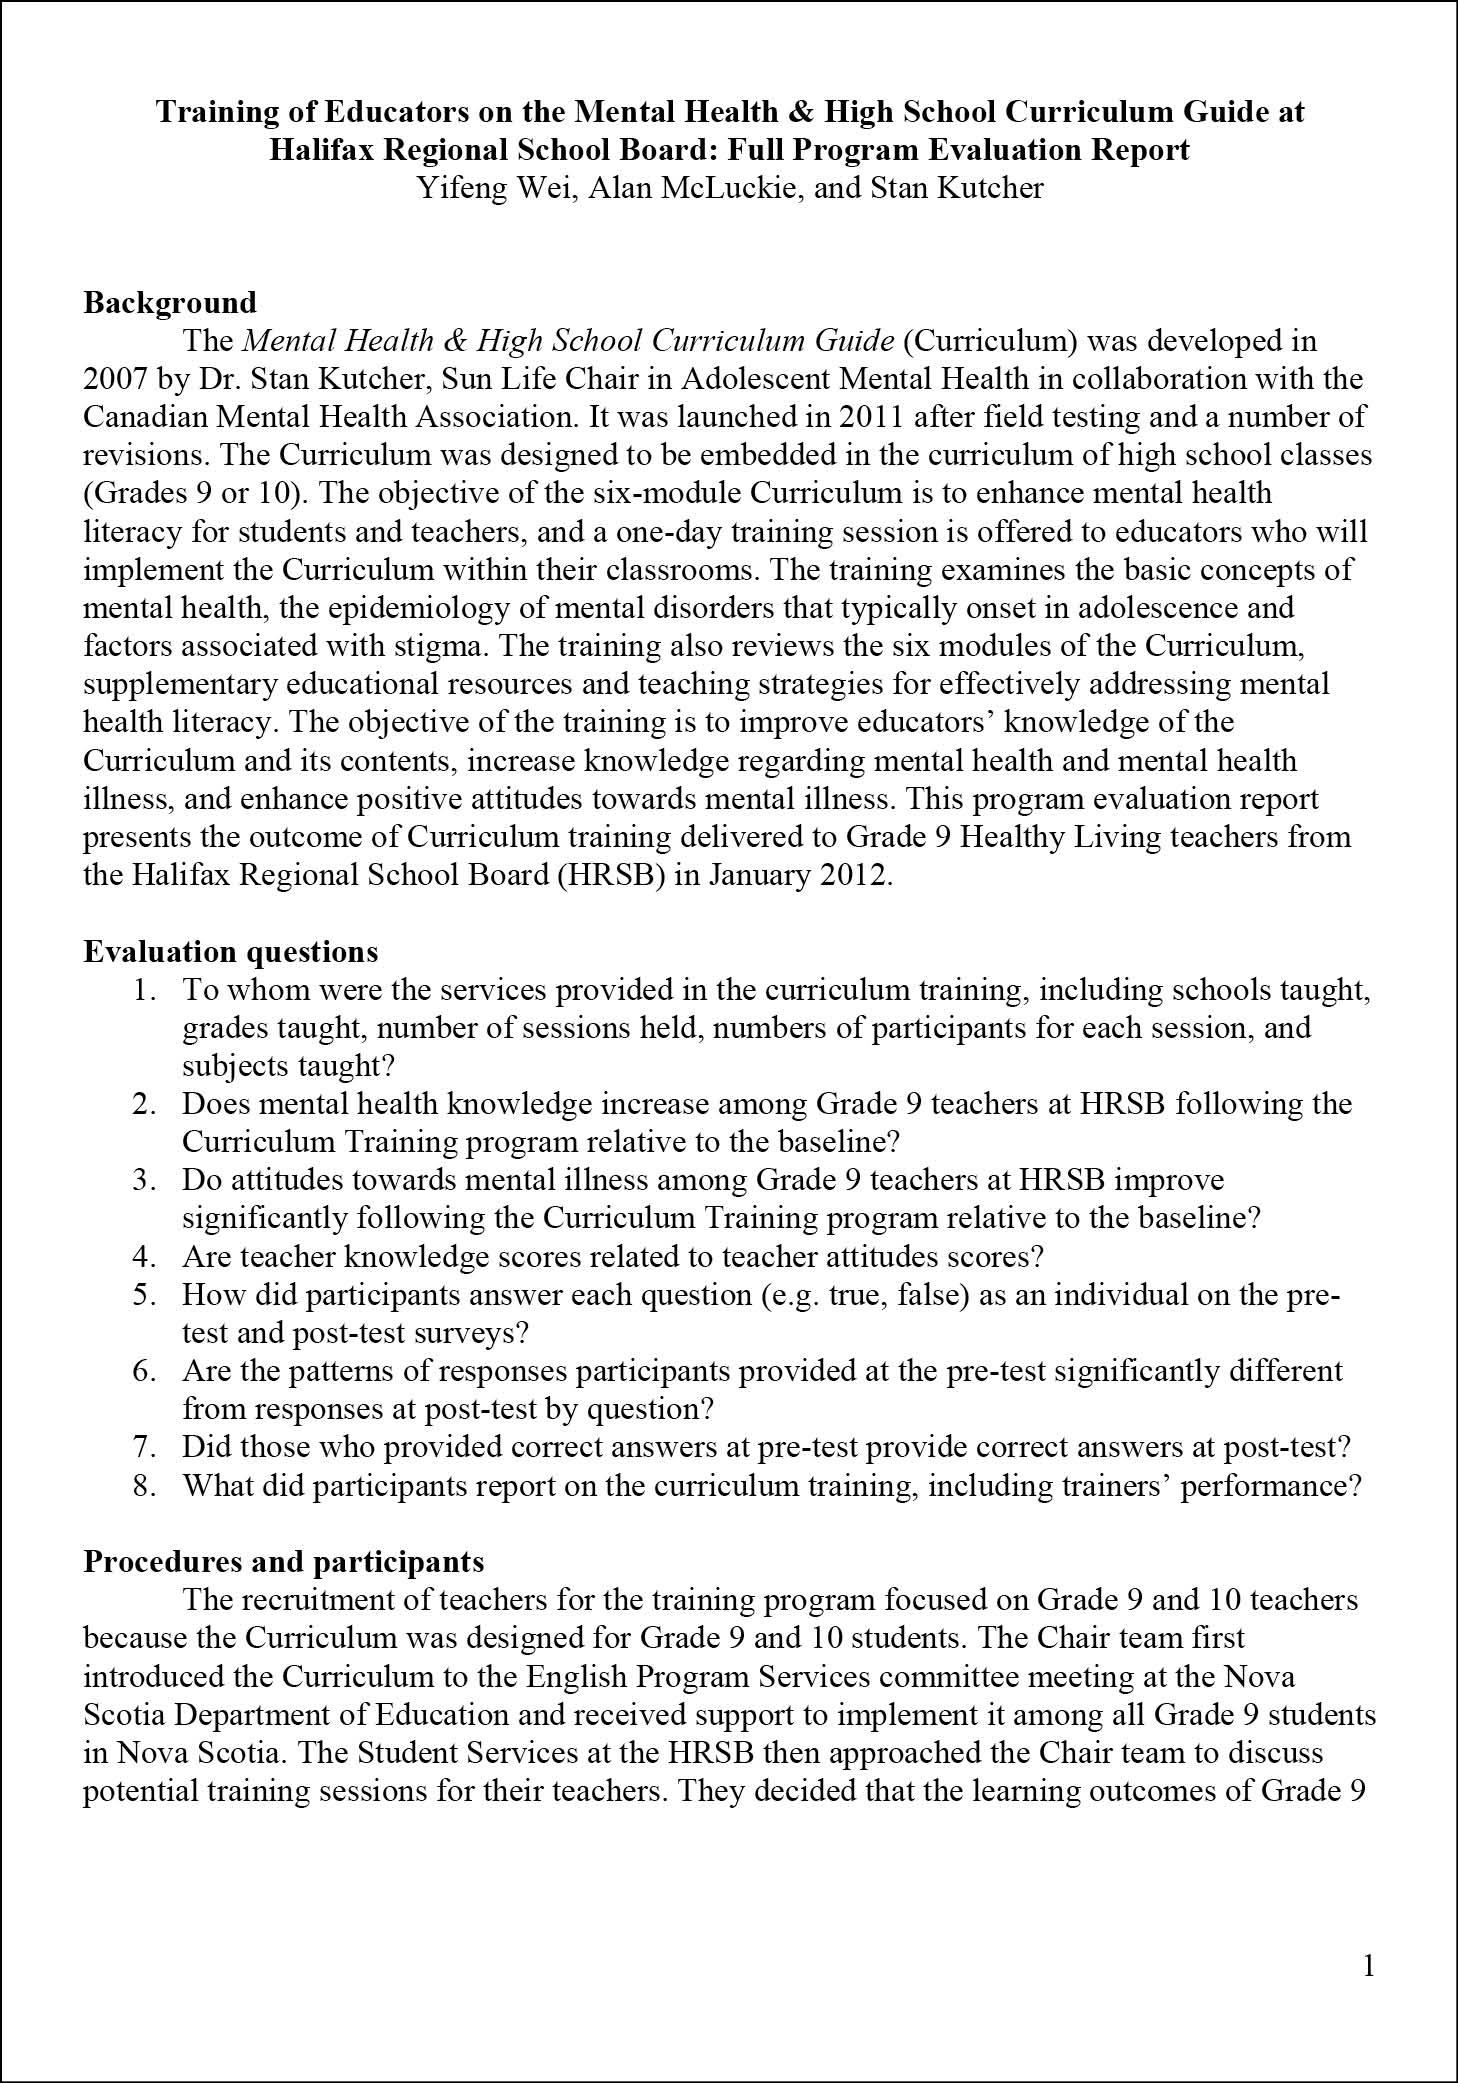 Mental Health  High School Curriculum Training Full Evaluation Report  Part 1  Teen Mental